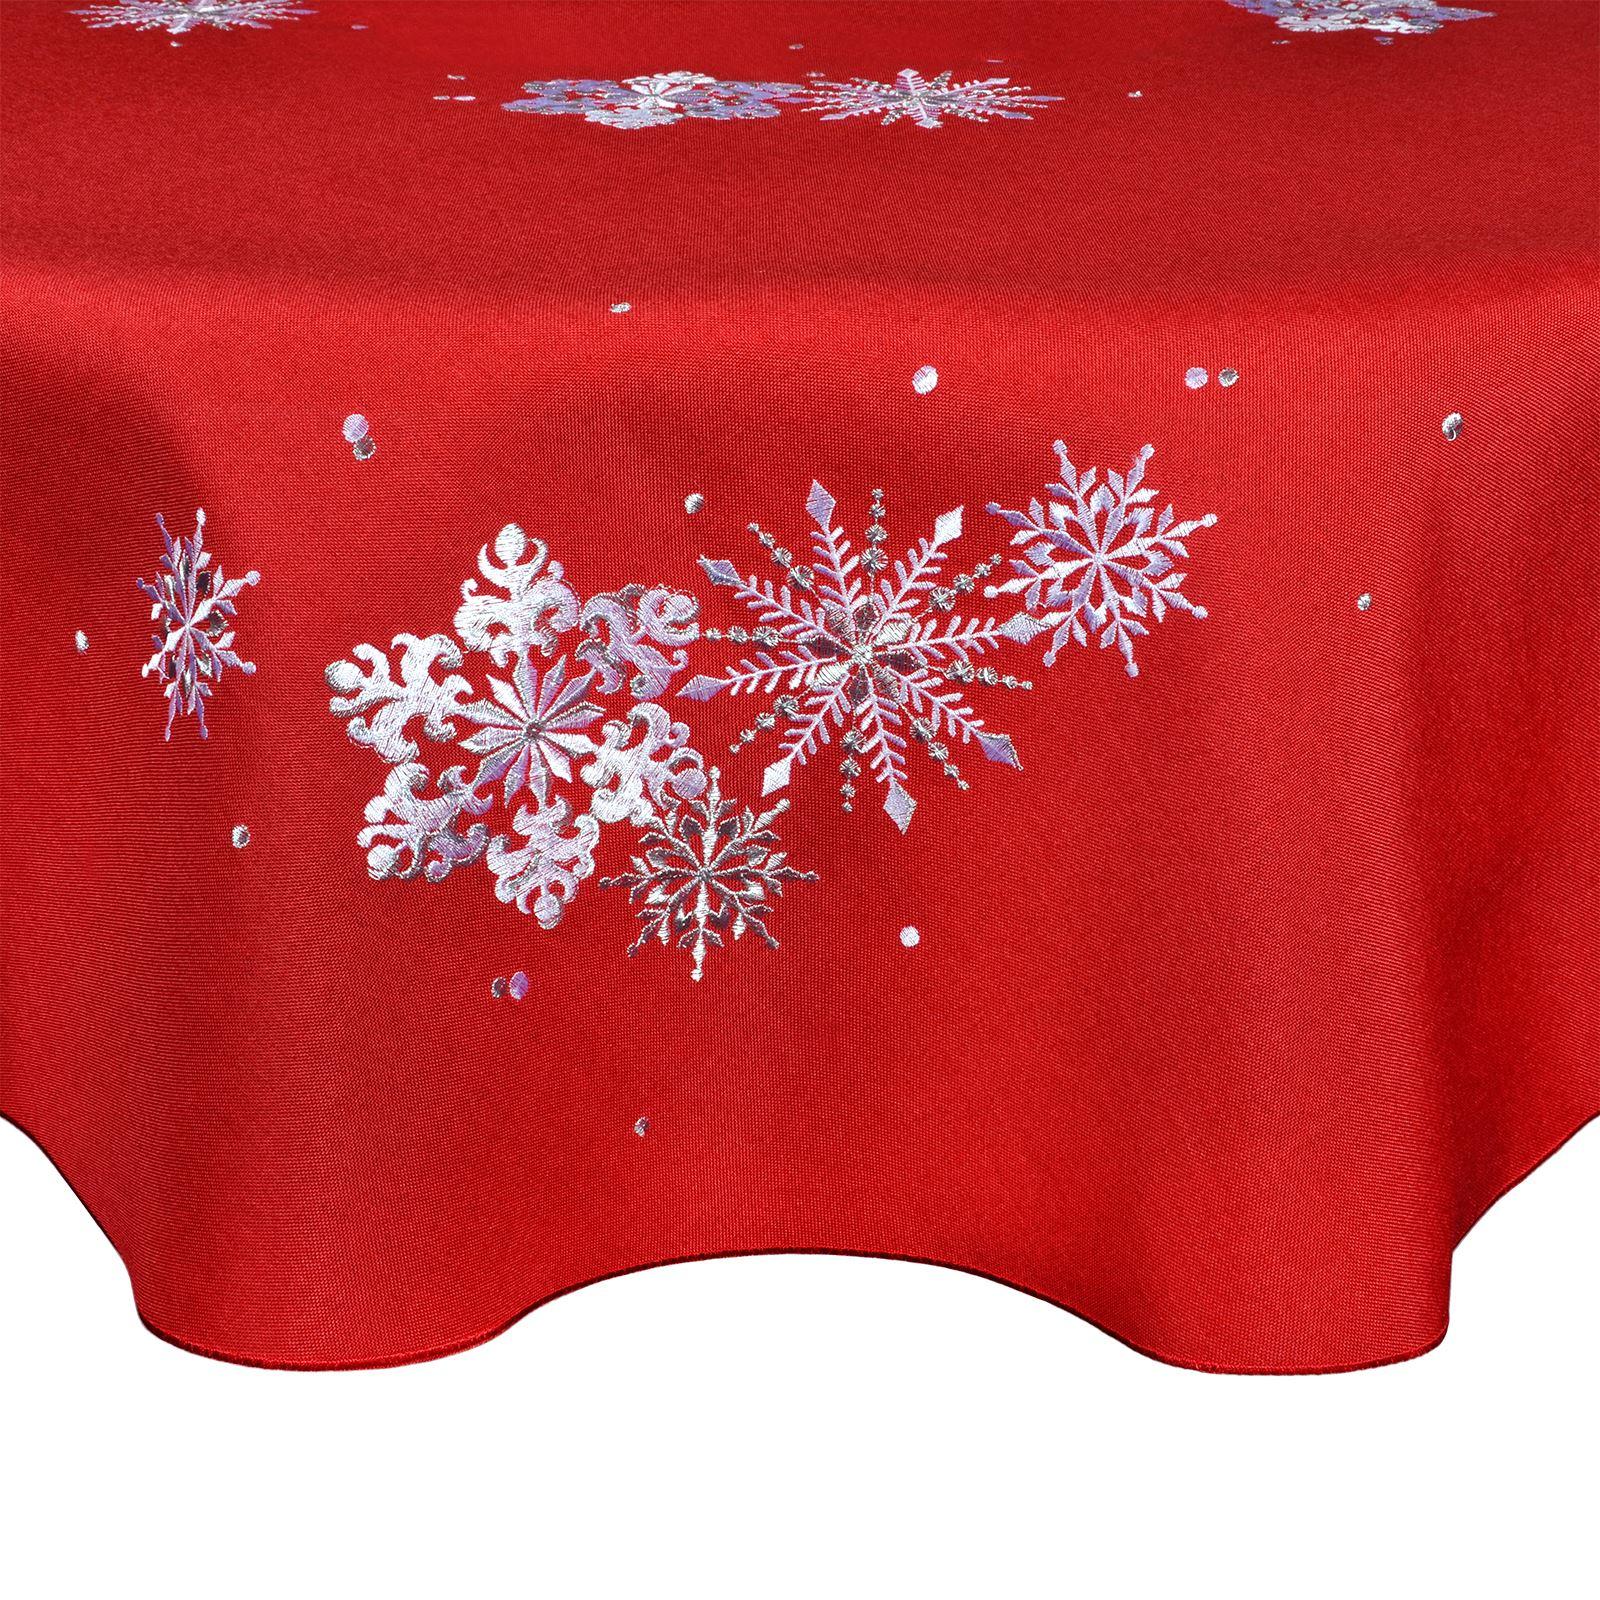 Christmas-Tablecloth-Festive-Pattern-Rectangle-Round-Fabric-Xmas-Room-Decoration Indexbild 40